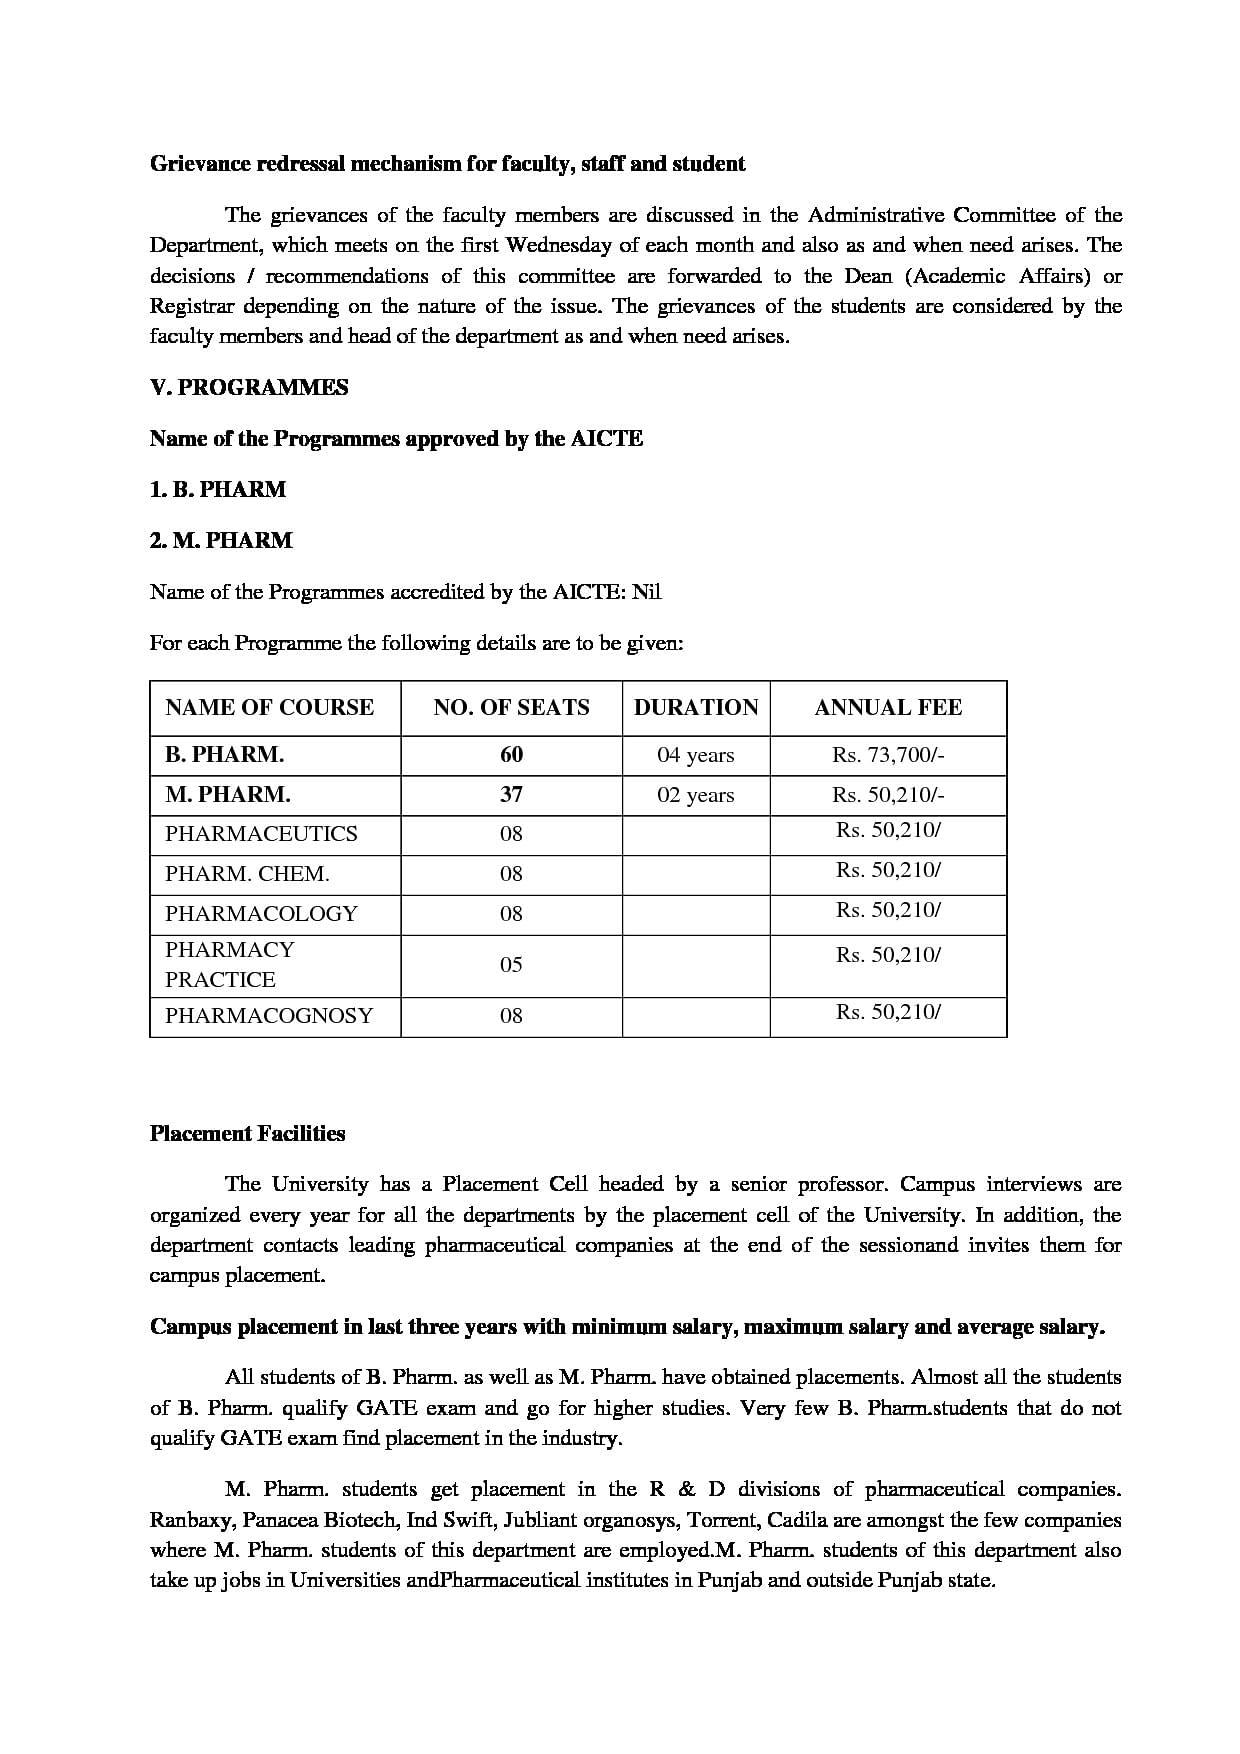 Punjabi University, Patiala - Courses, Fees, Admissions 2019